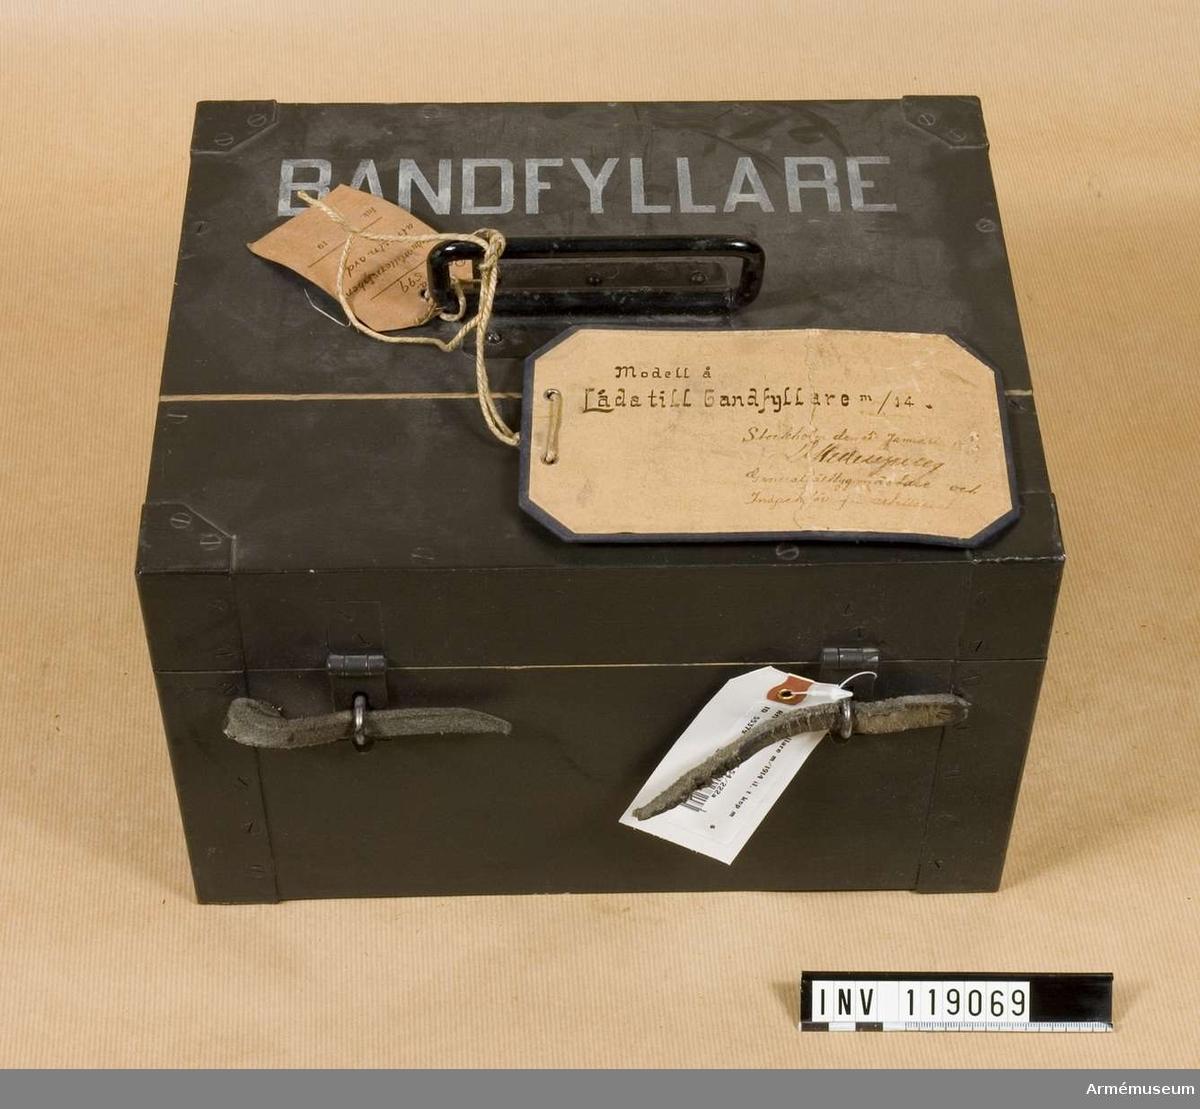 Bandfyllare m/1914